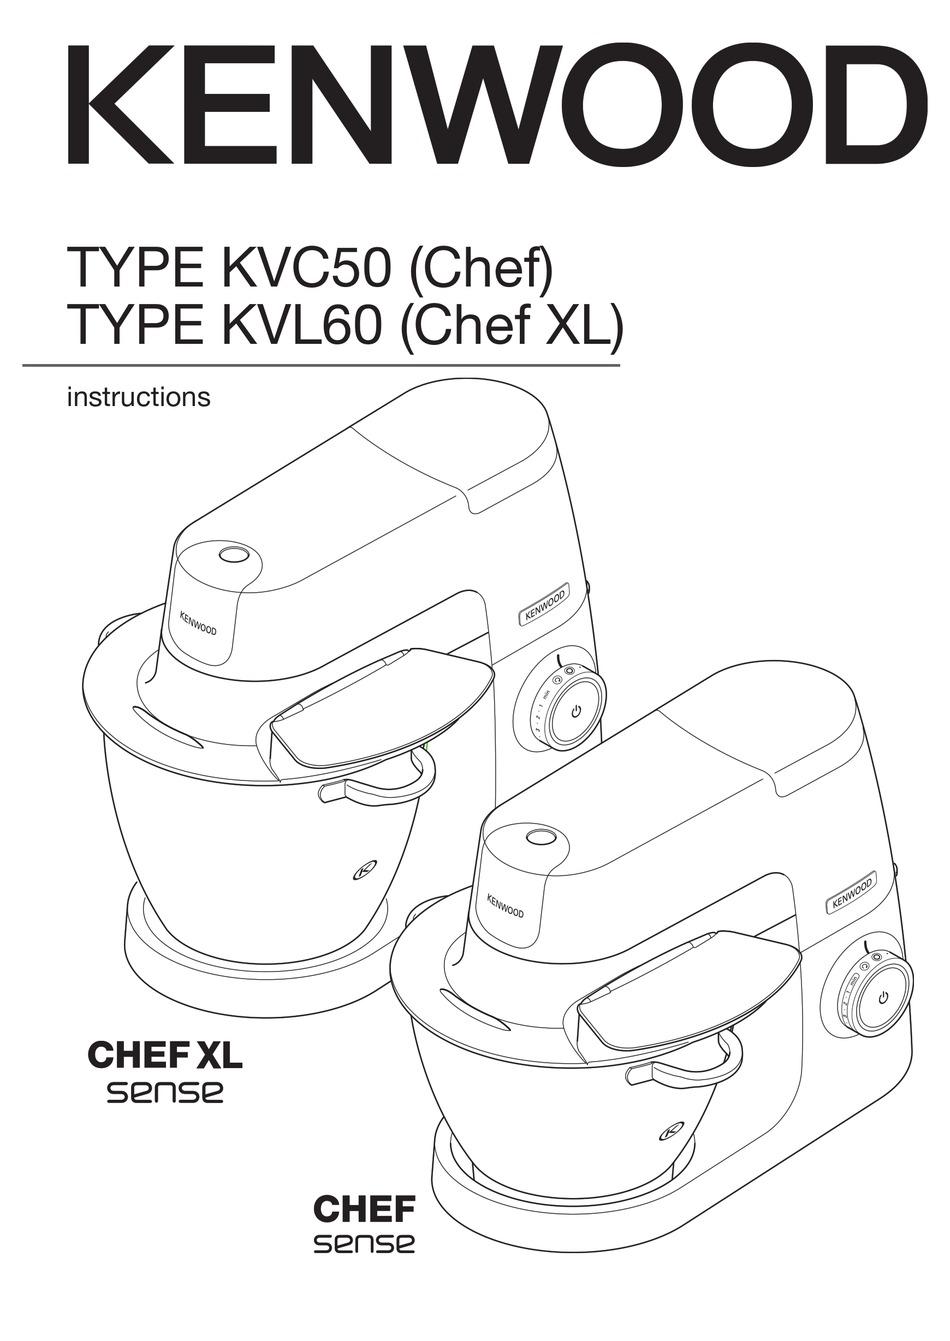 KENWOOD CHEF SENSE KVC50 INSTRUCTIONS MANUAL Pdf Download